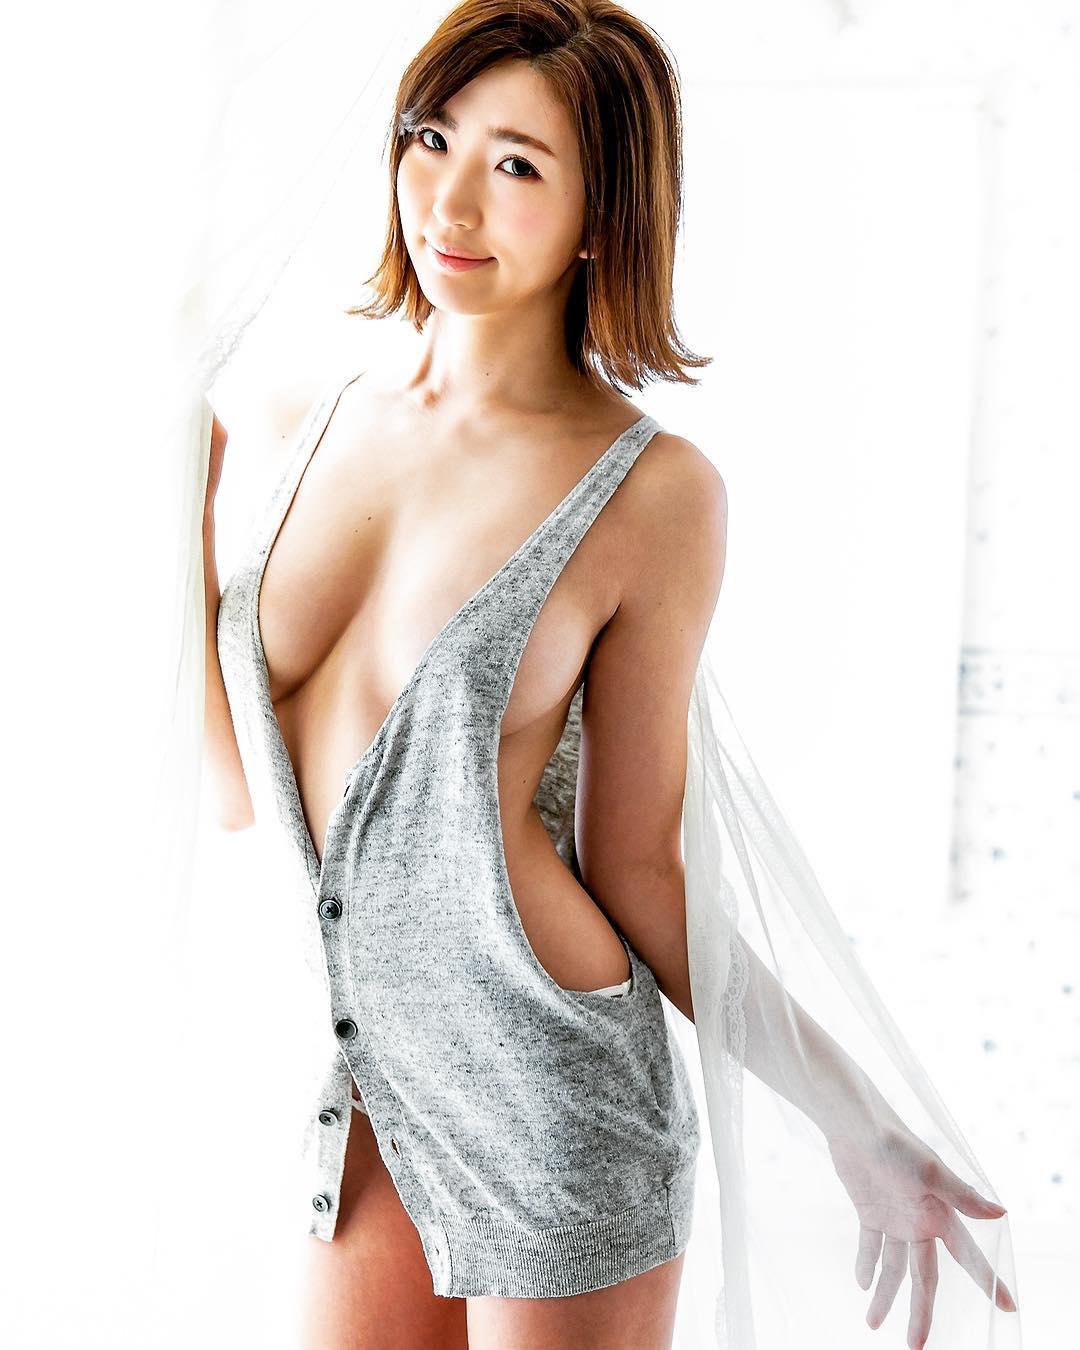 matsushima_eimi153.jpg